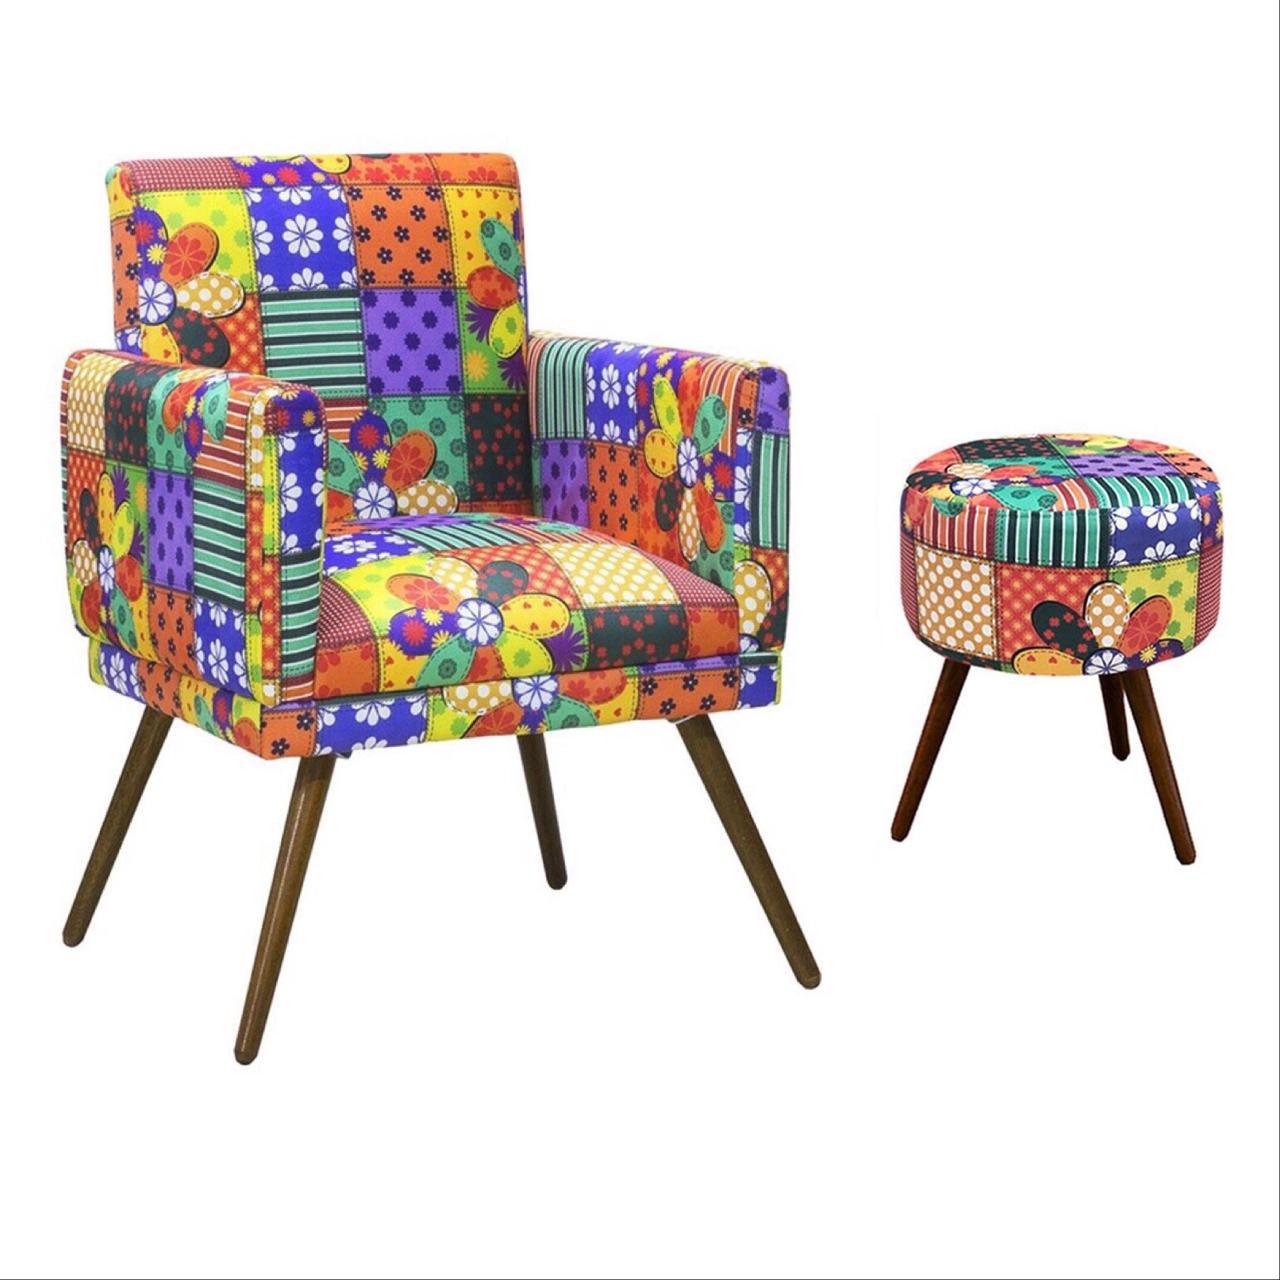 Kit Poltrona Decorativa Nina com rodapé e Puff redondo Patchwork - Bela Casa Shop